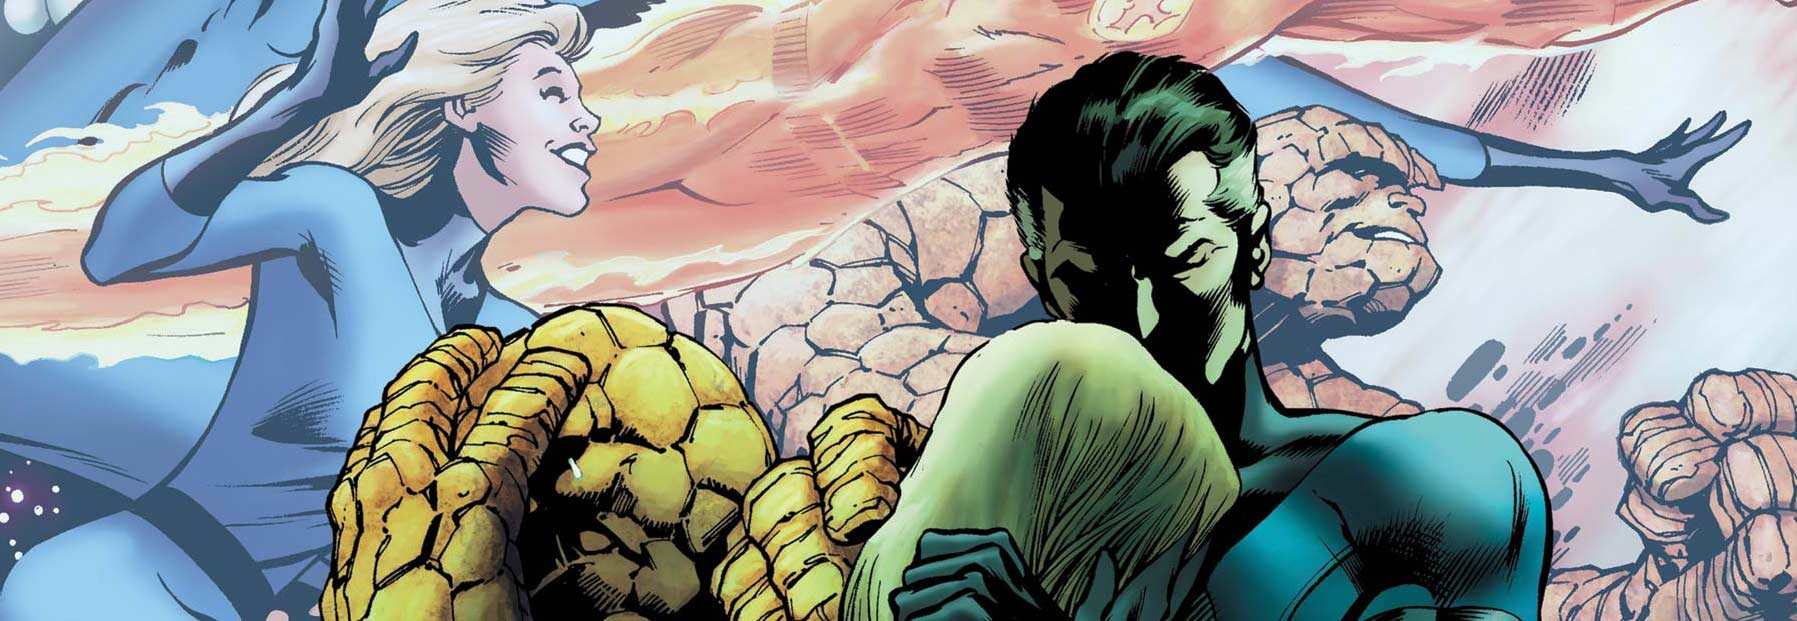 Top 100 Comics Of The 10s: 10. Fantastic Four (Jonathan Hickman)